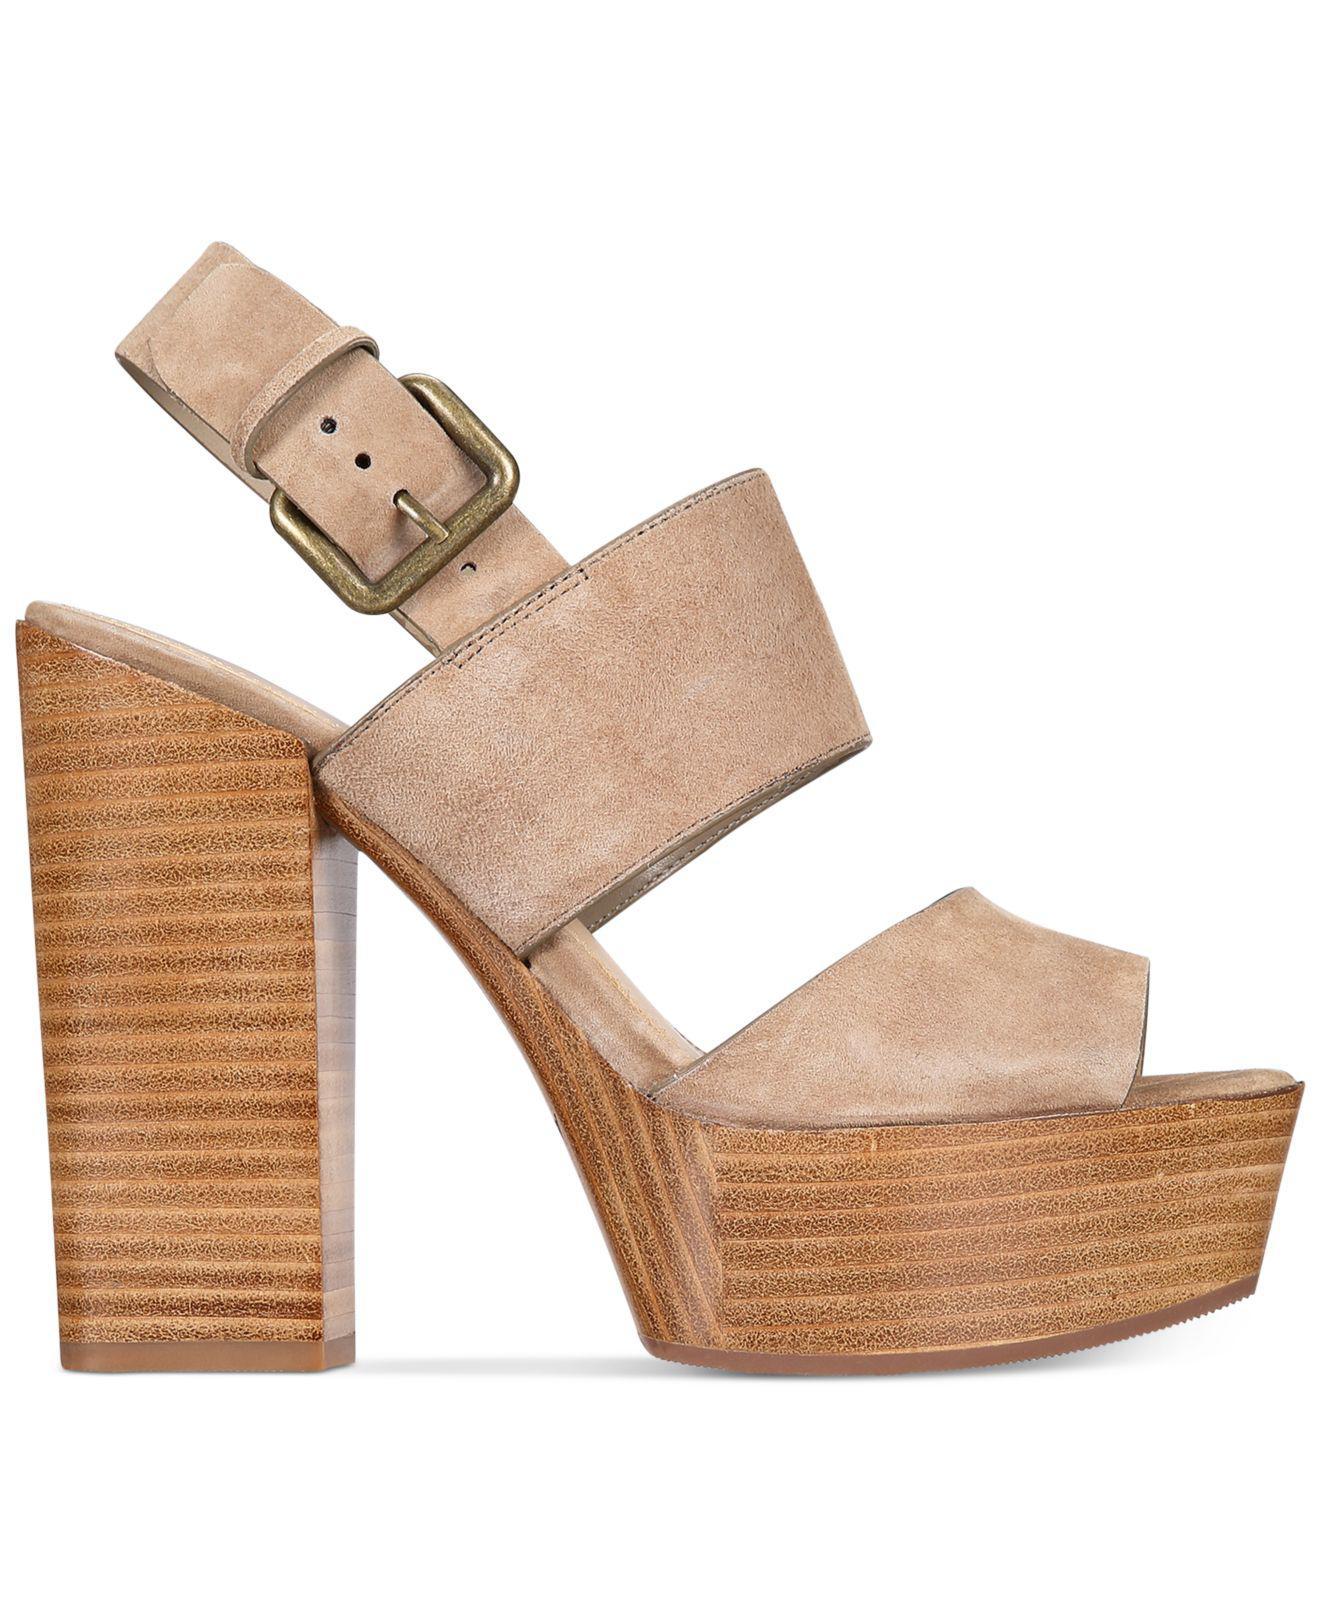 95a0e1f458 ALDO Women's Maximoa Platform Block-heel Sandals in Brown - Lyst